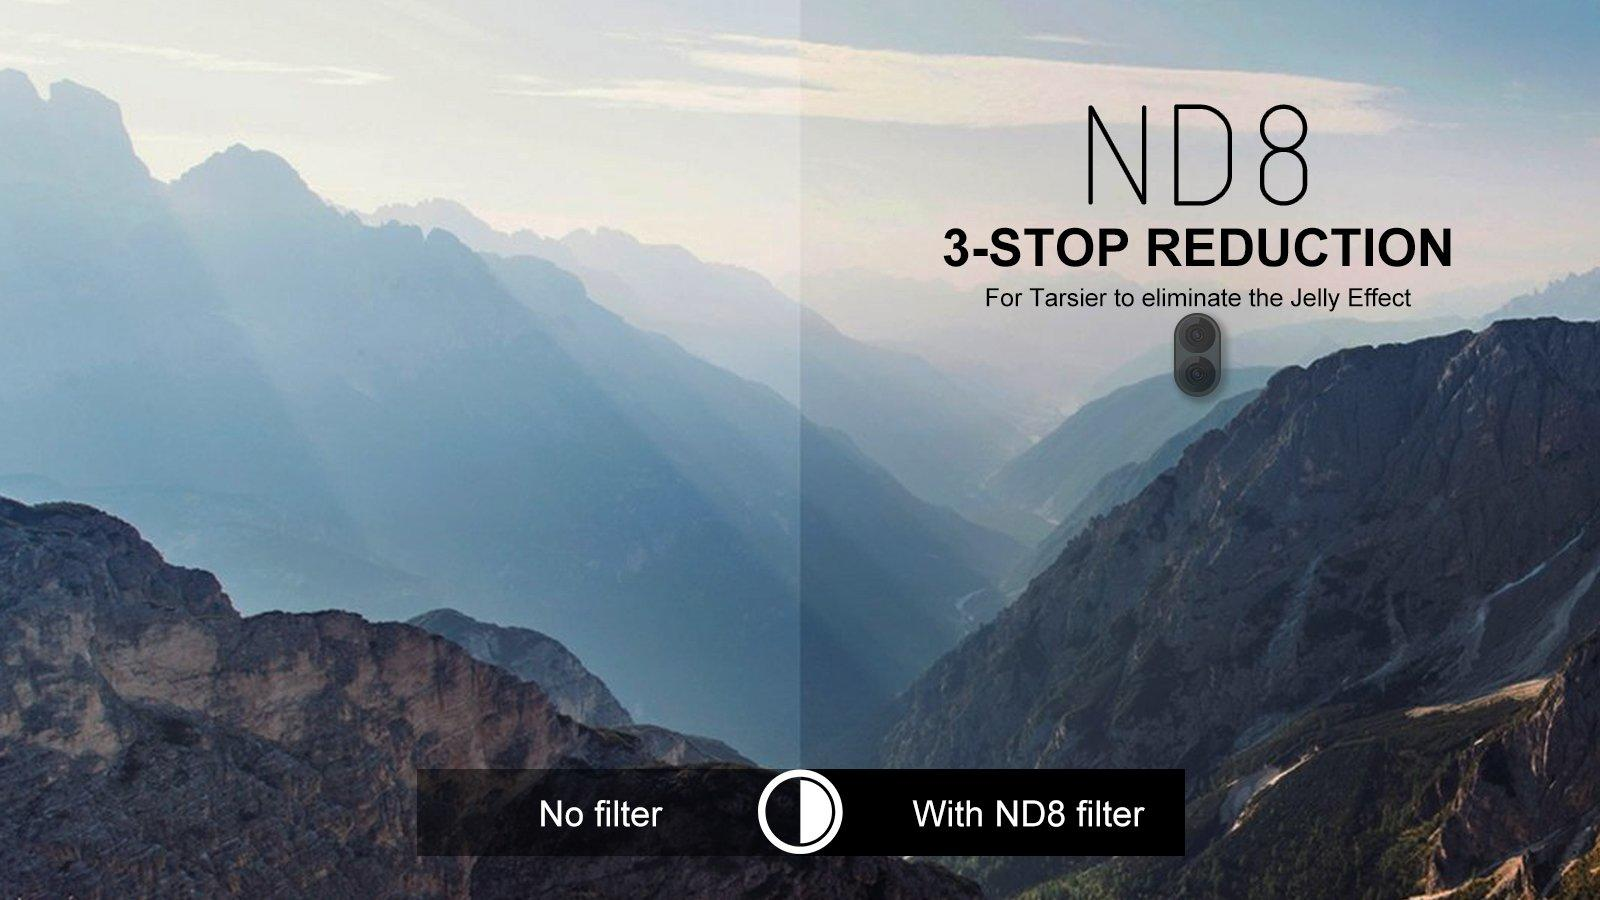 85x 4k nd filter nd8